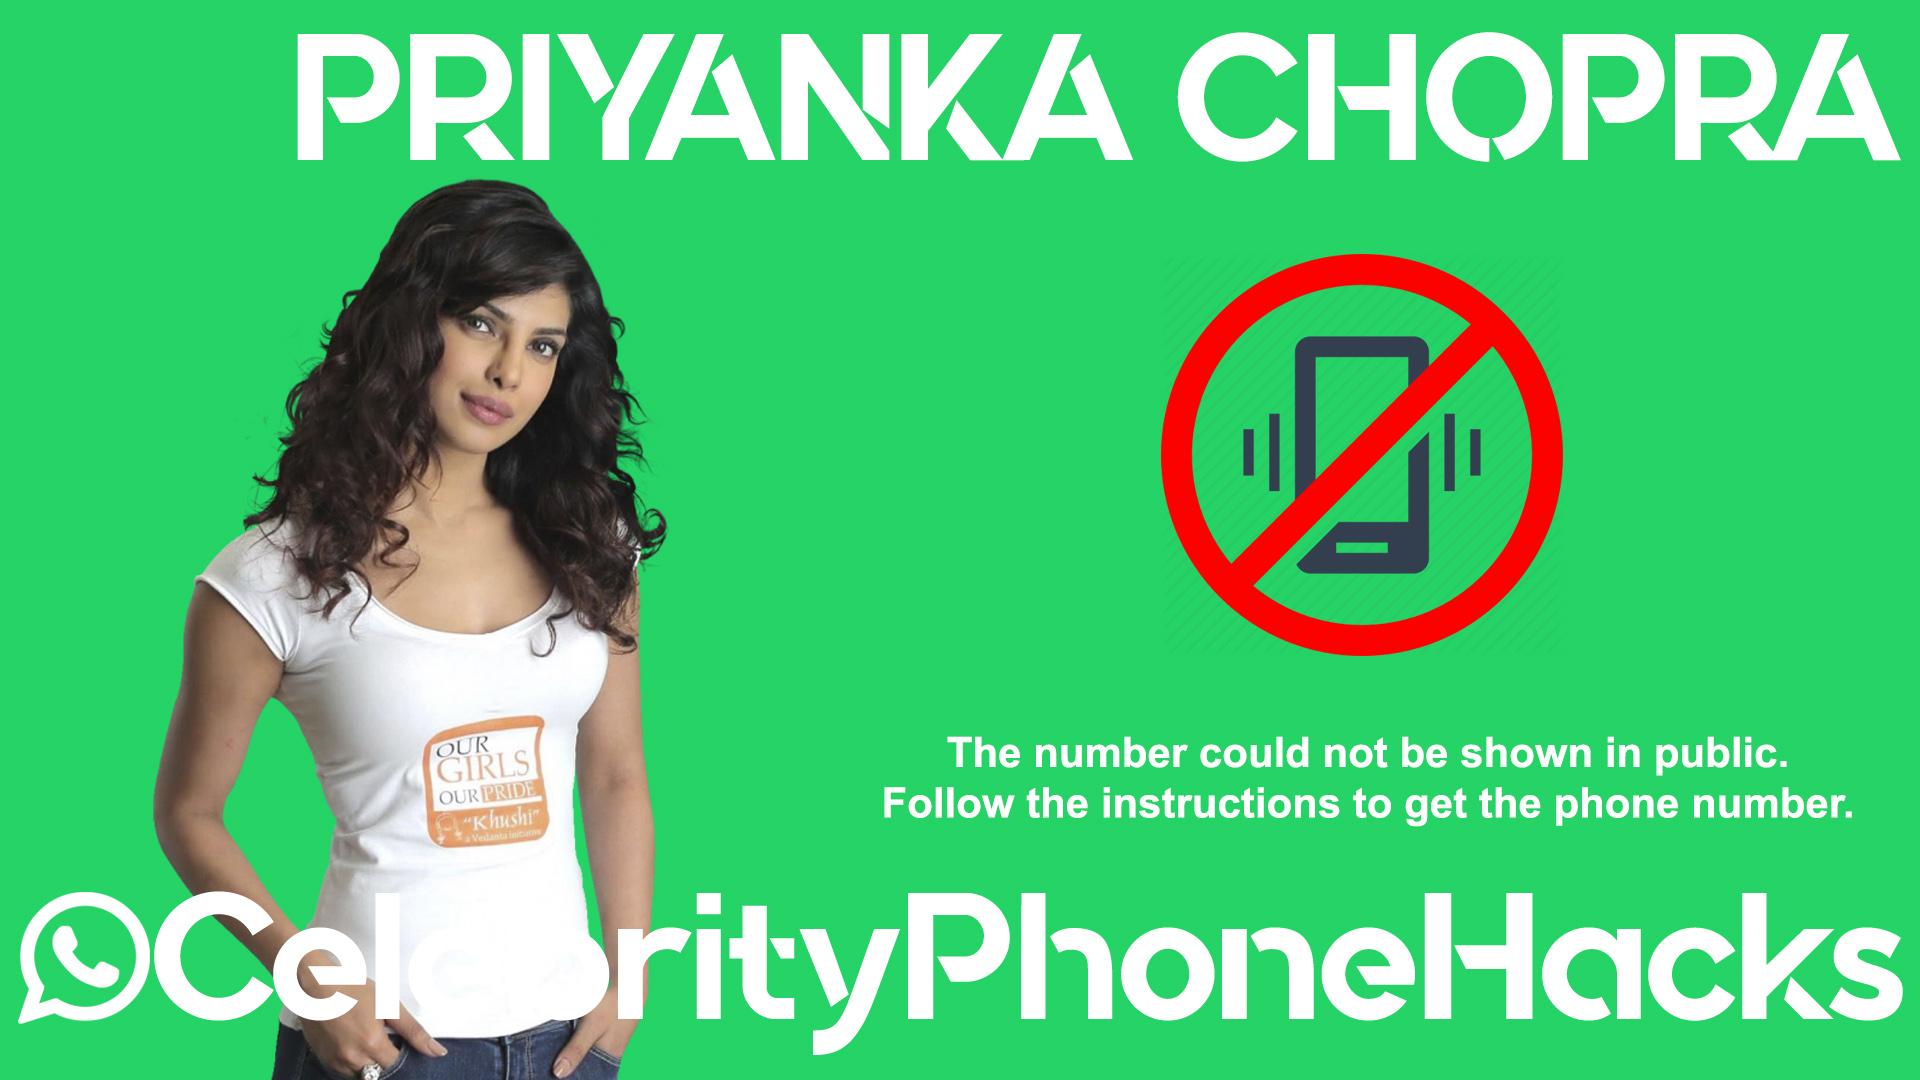 Priyanka Chopra real phone number 2019 whatsapp hacked leaked